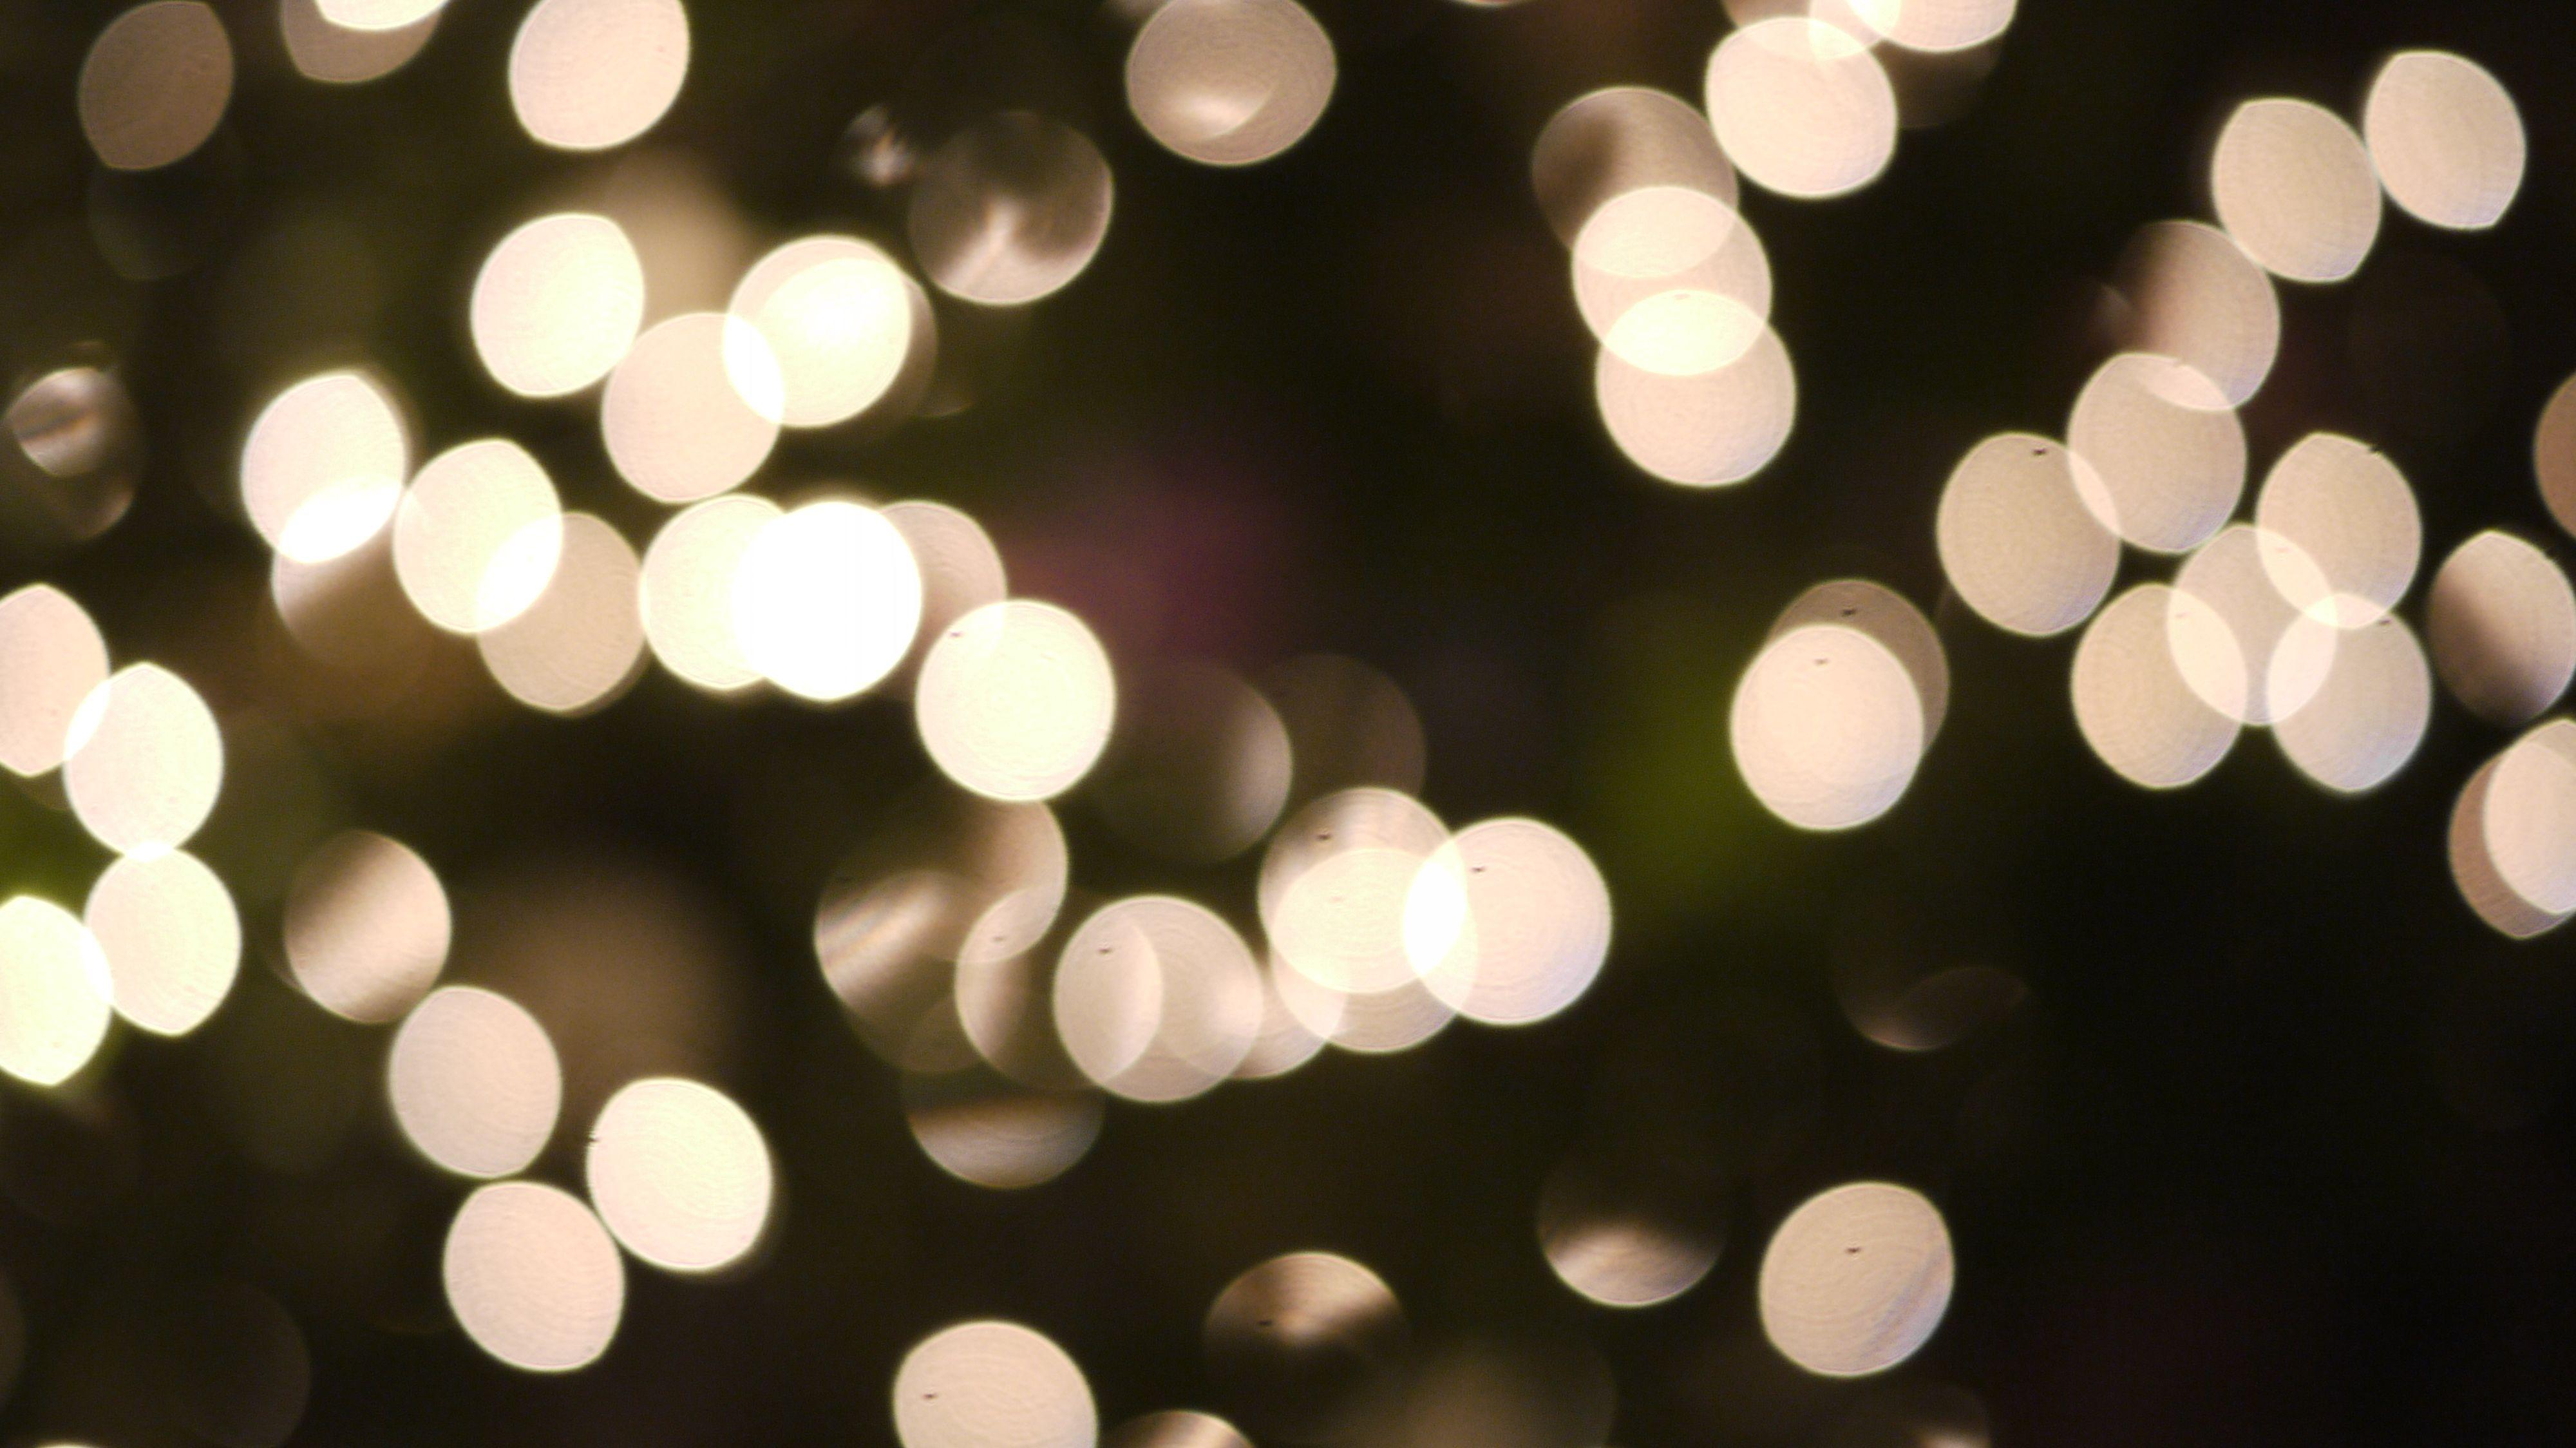 Blurry White Lights Lights Pinterest